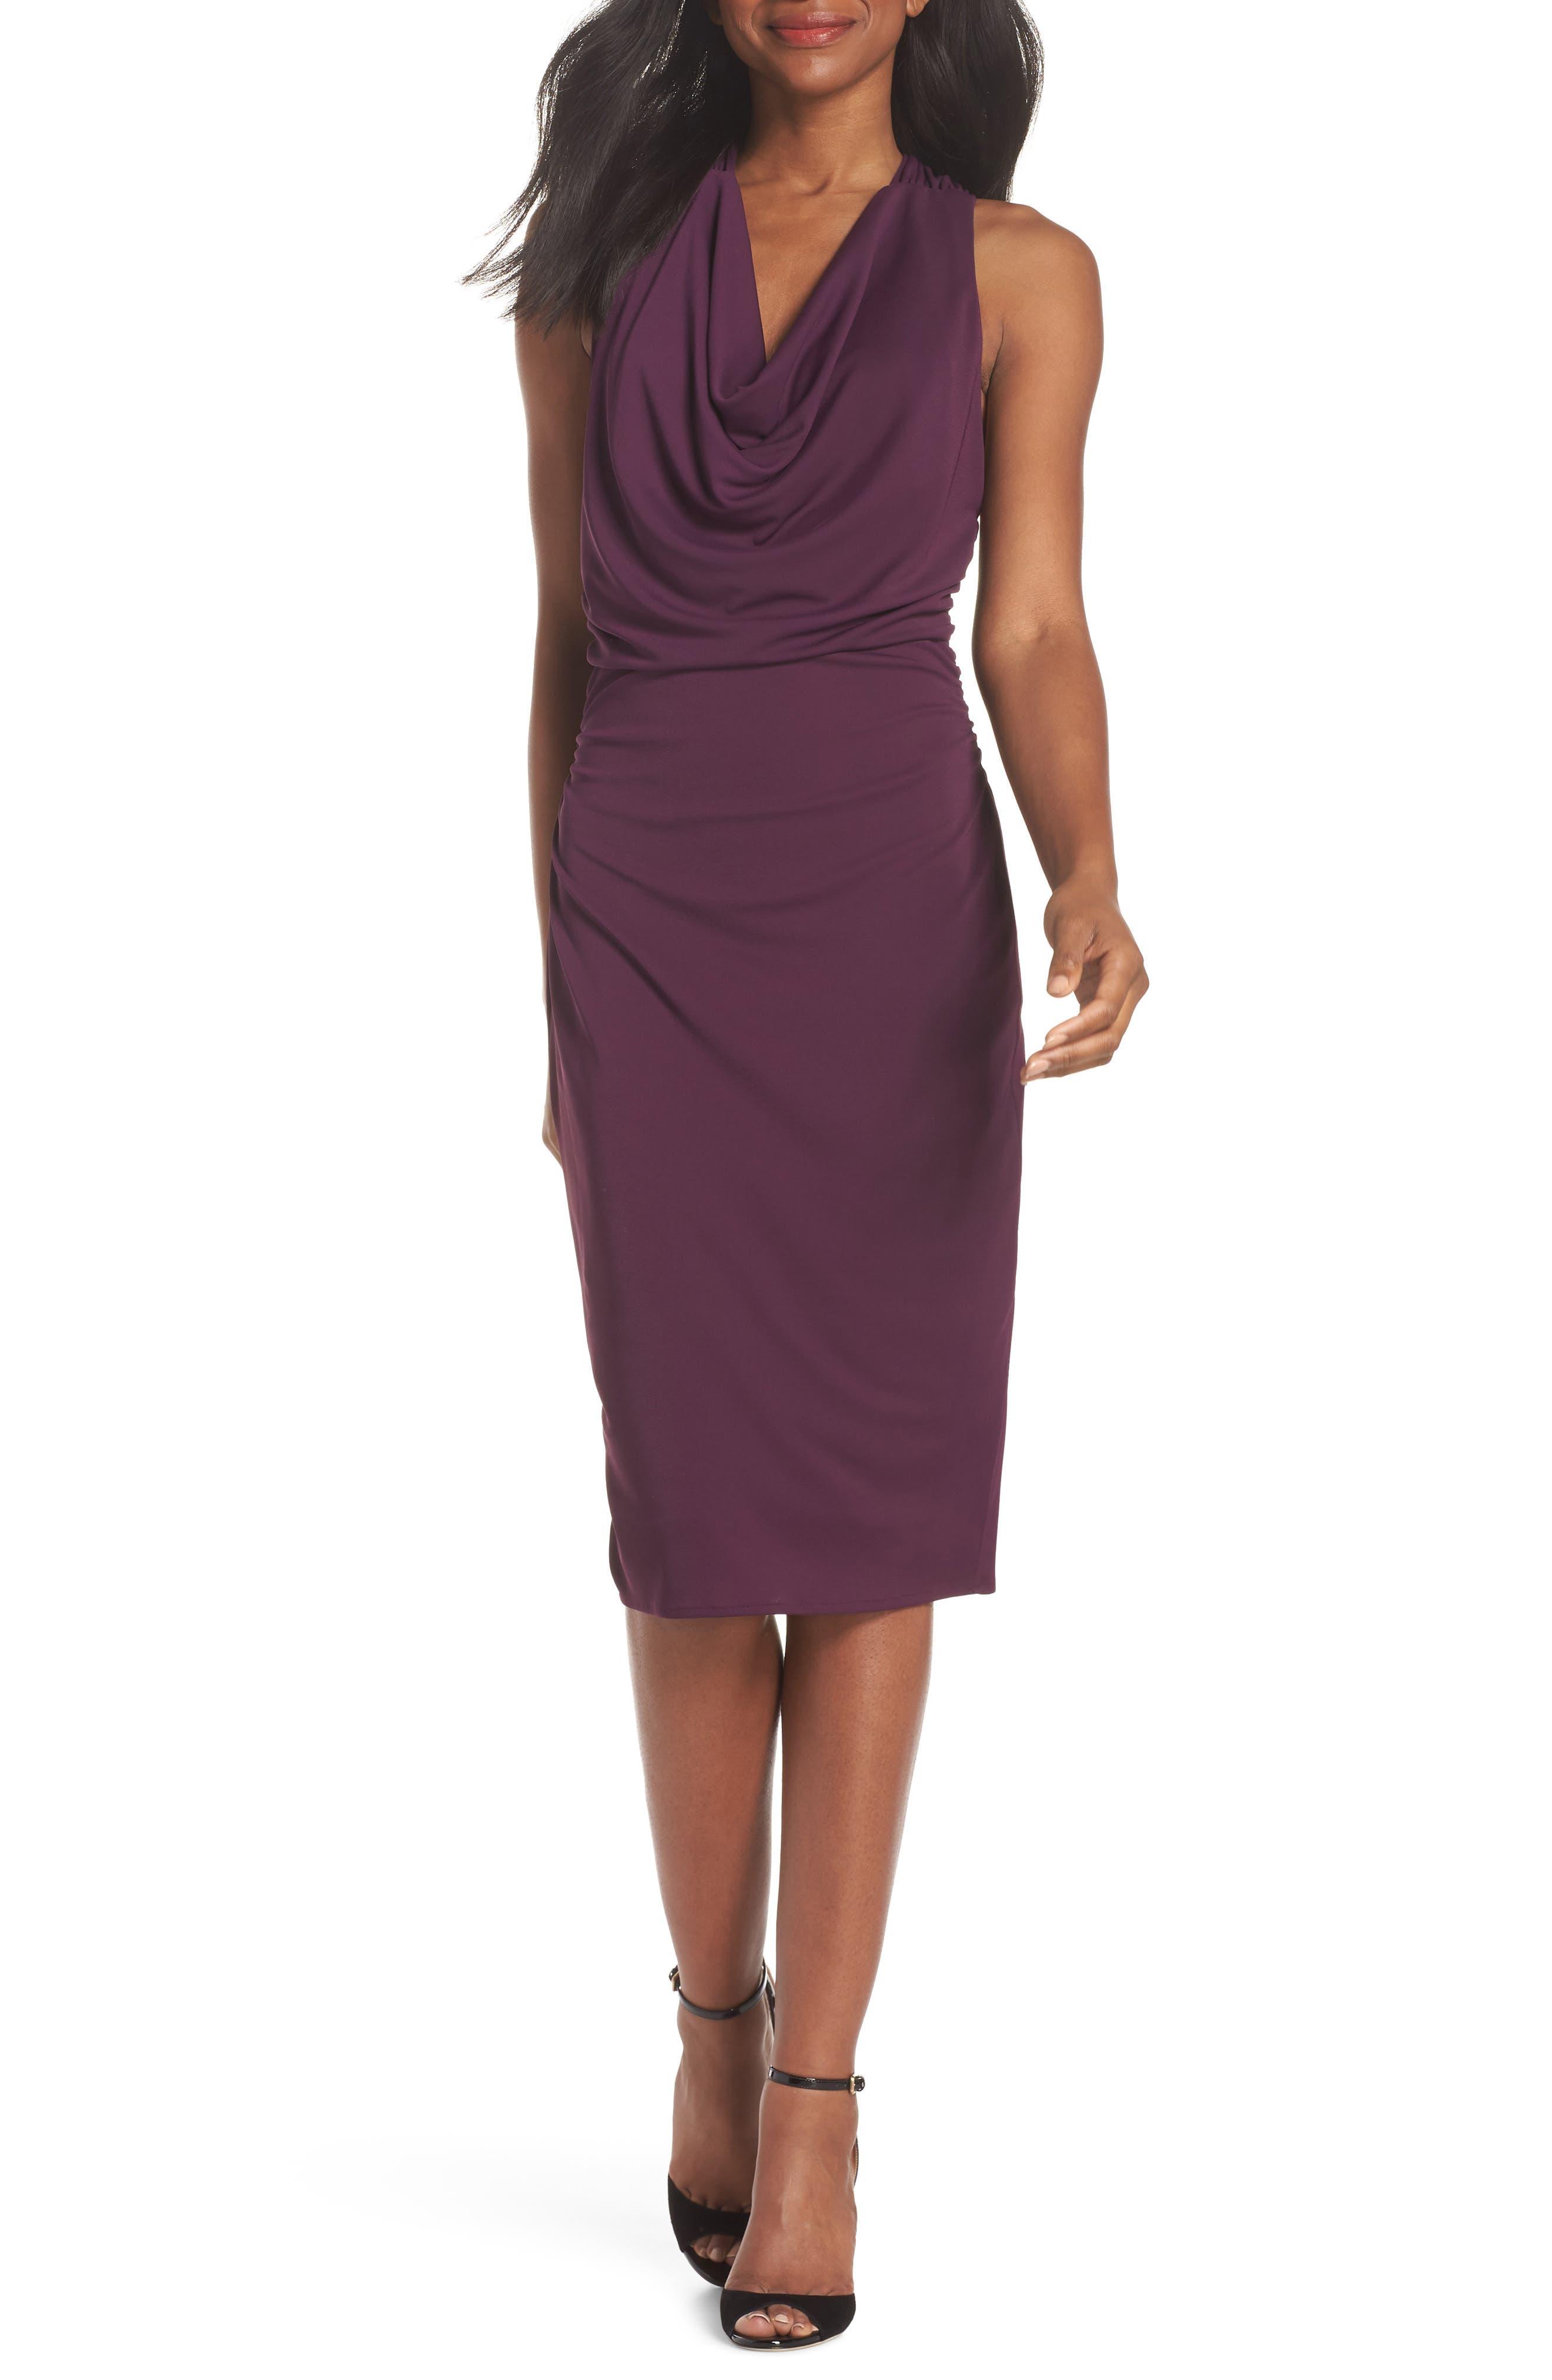 Elise Cowl Neck Sleeveless Dress,                             Main thumbnail 1, color,                             Wine